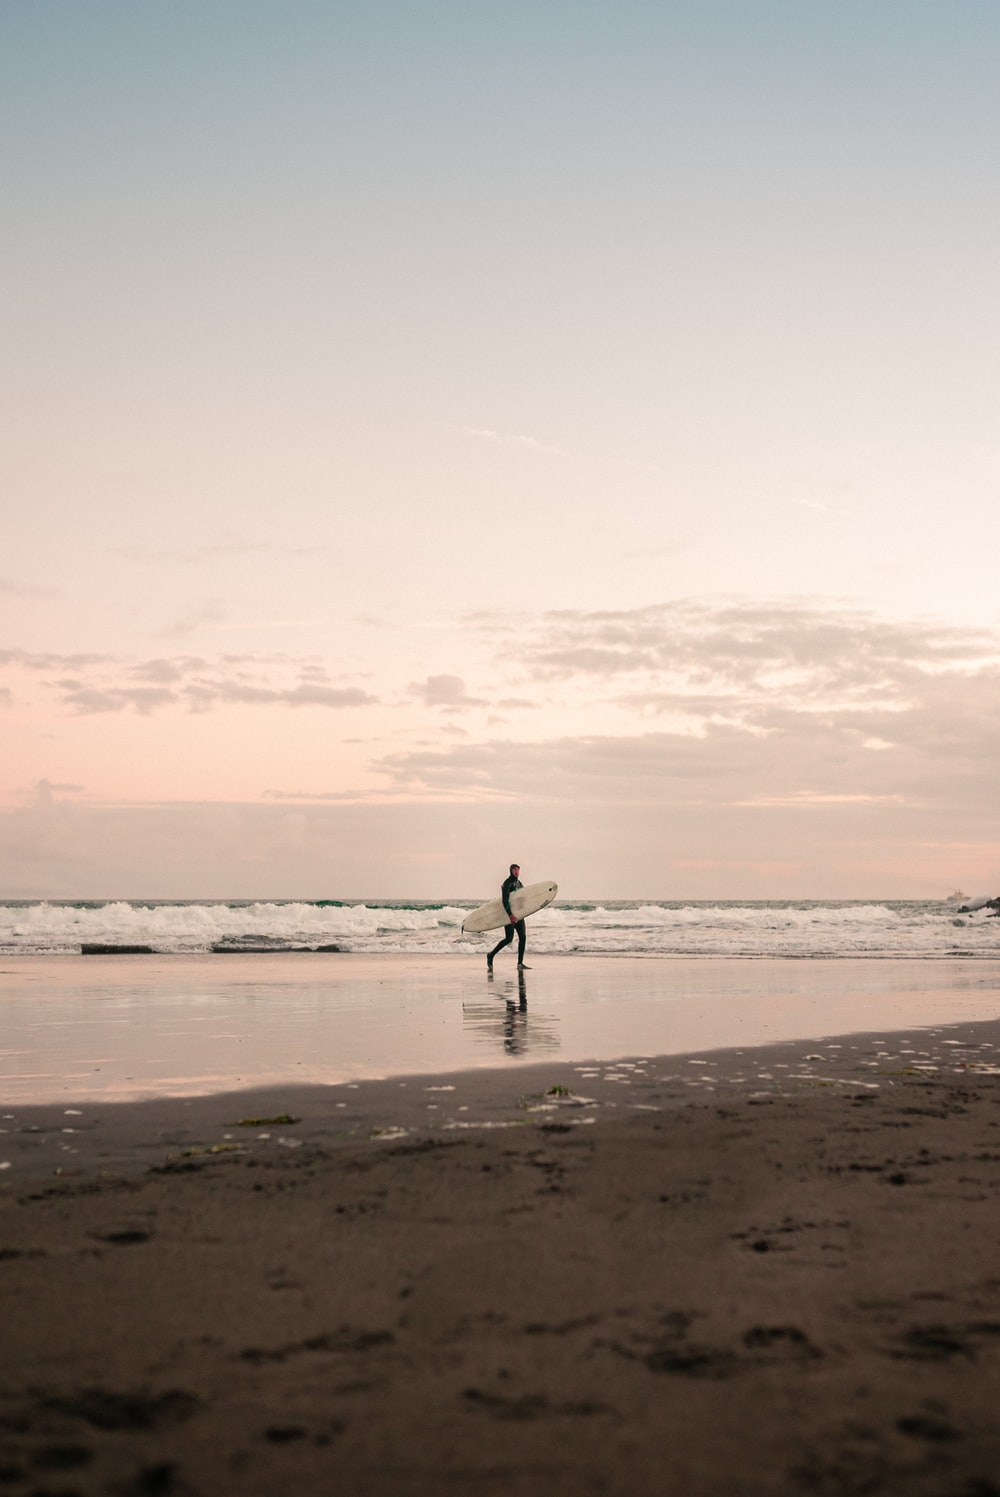 silhouette of man walking on beach during daytime